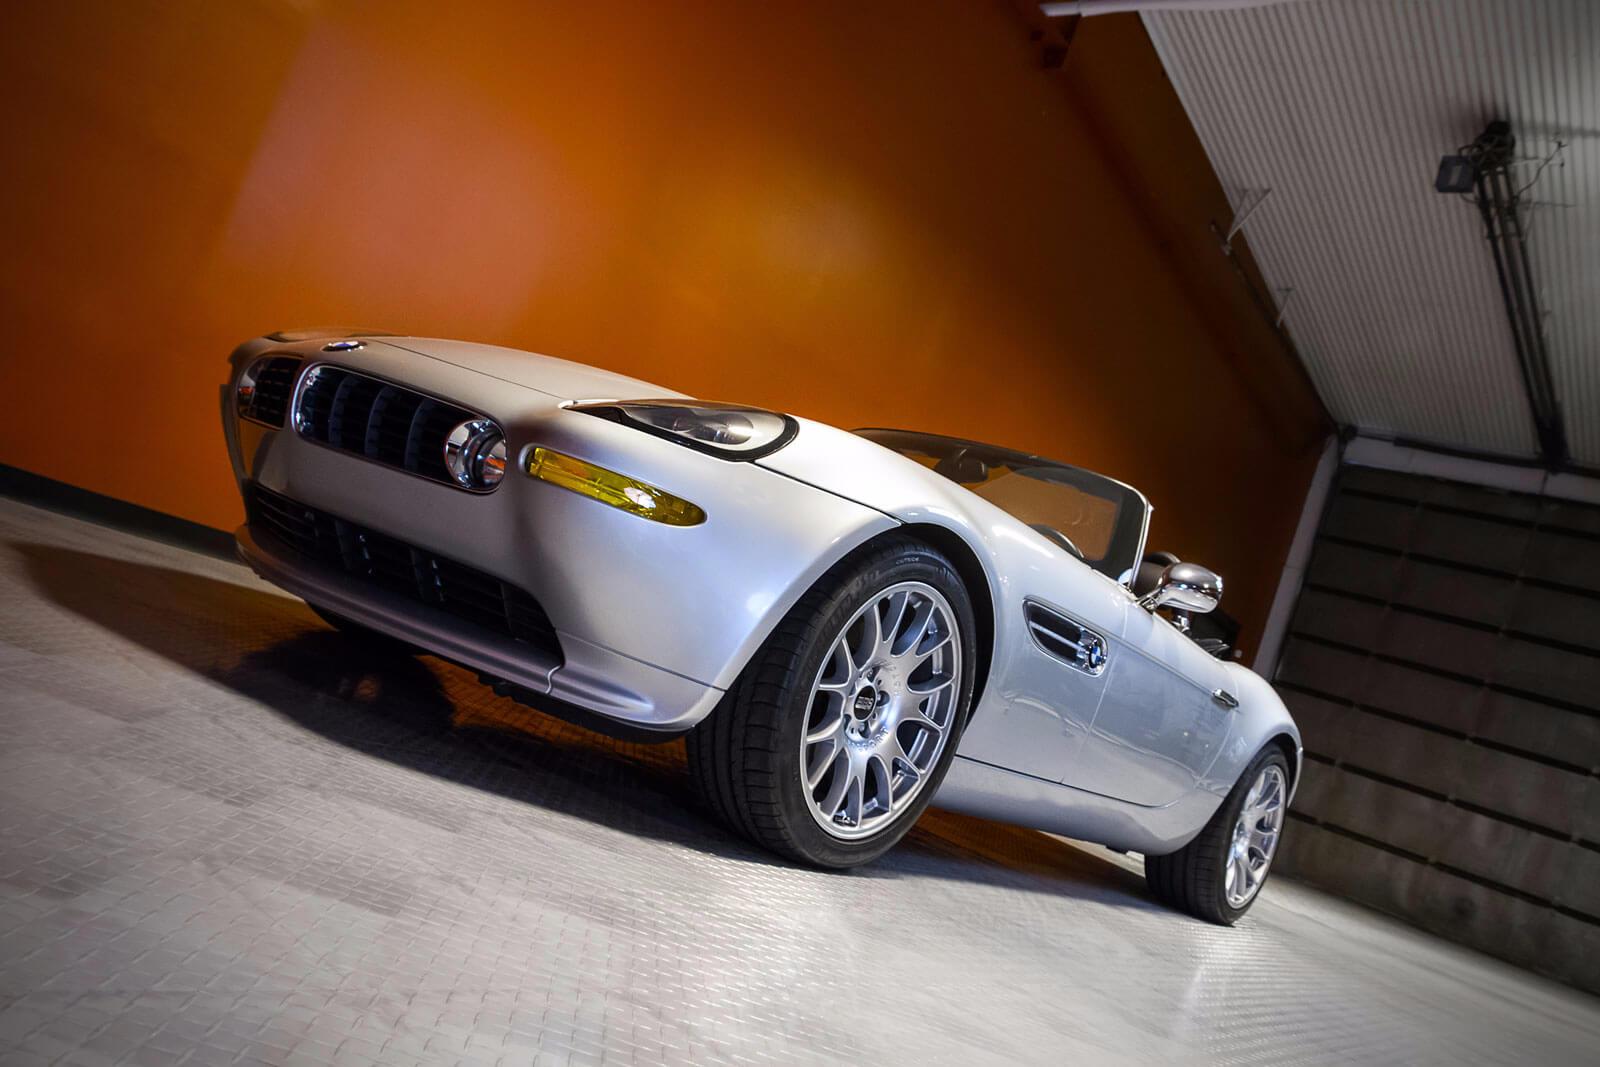 BMW on a diamond-plate garage floor